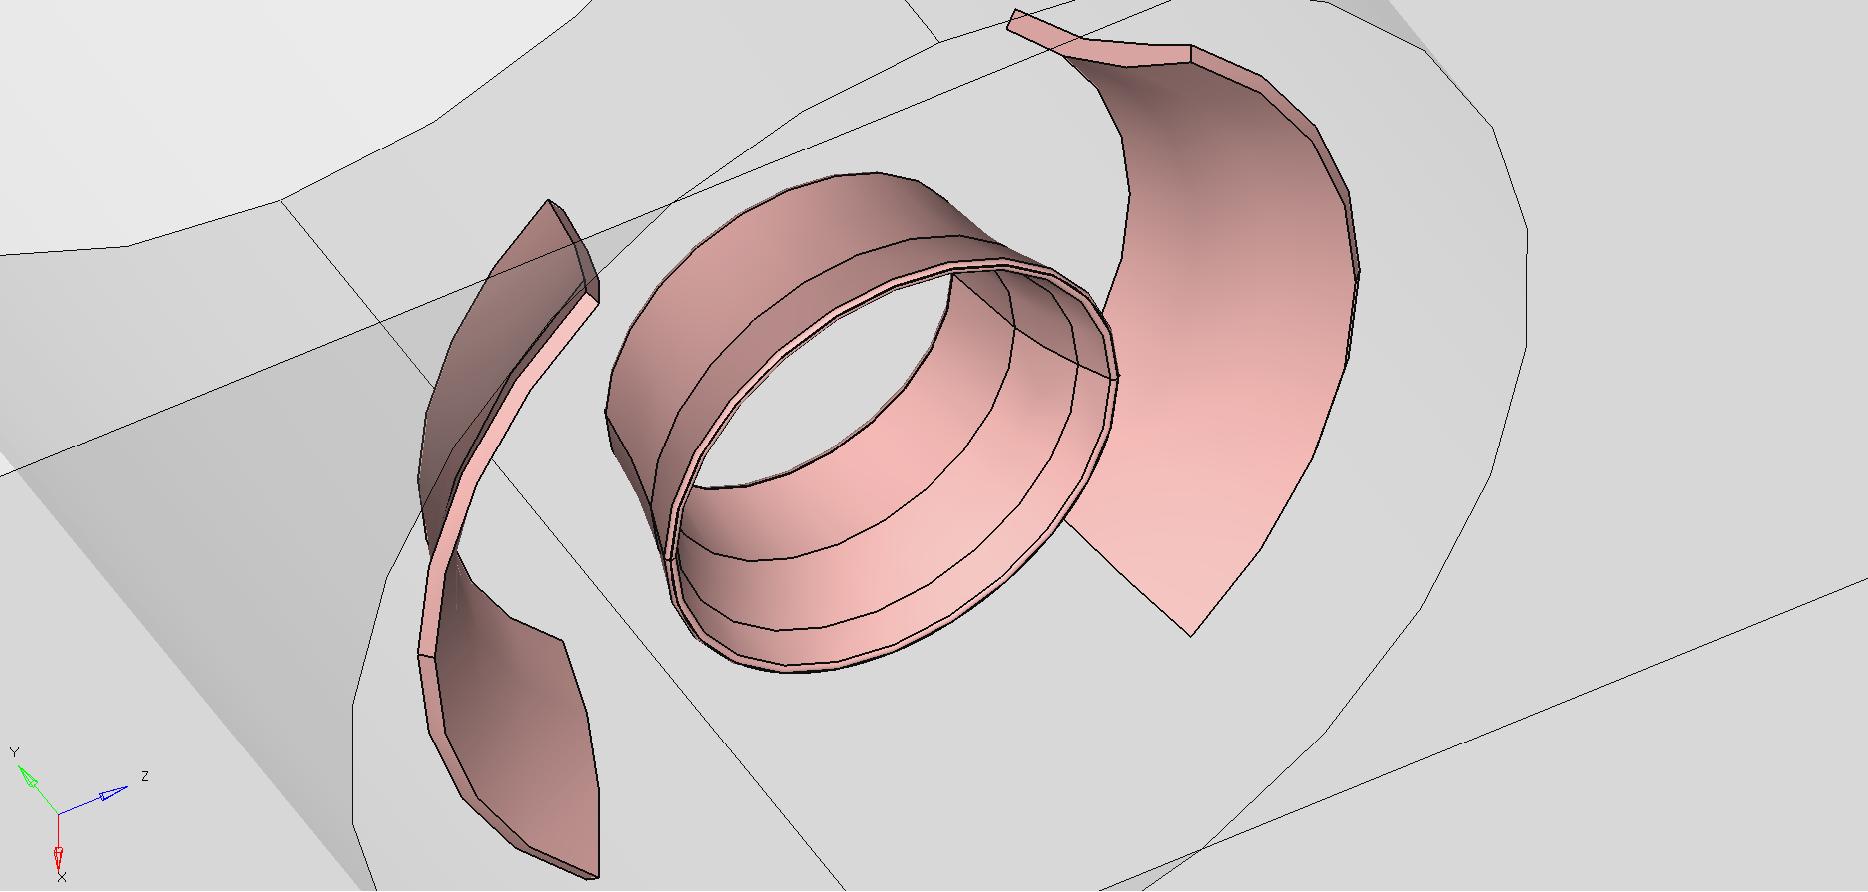 Diverter geometry details